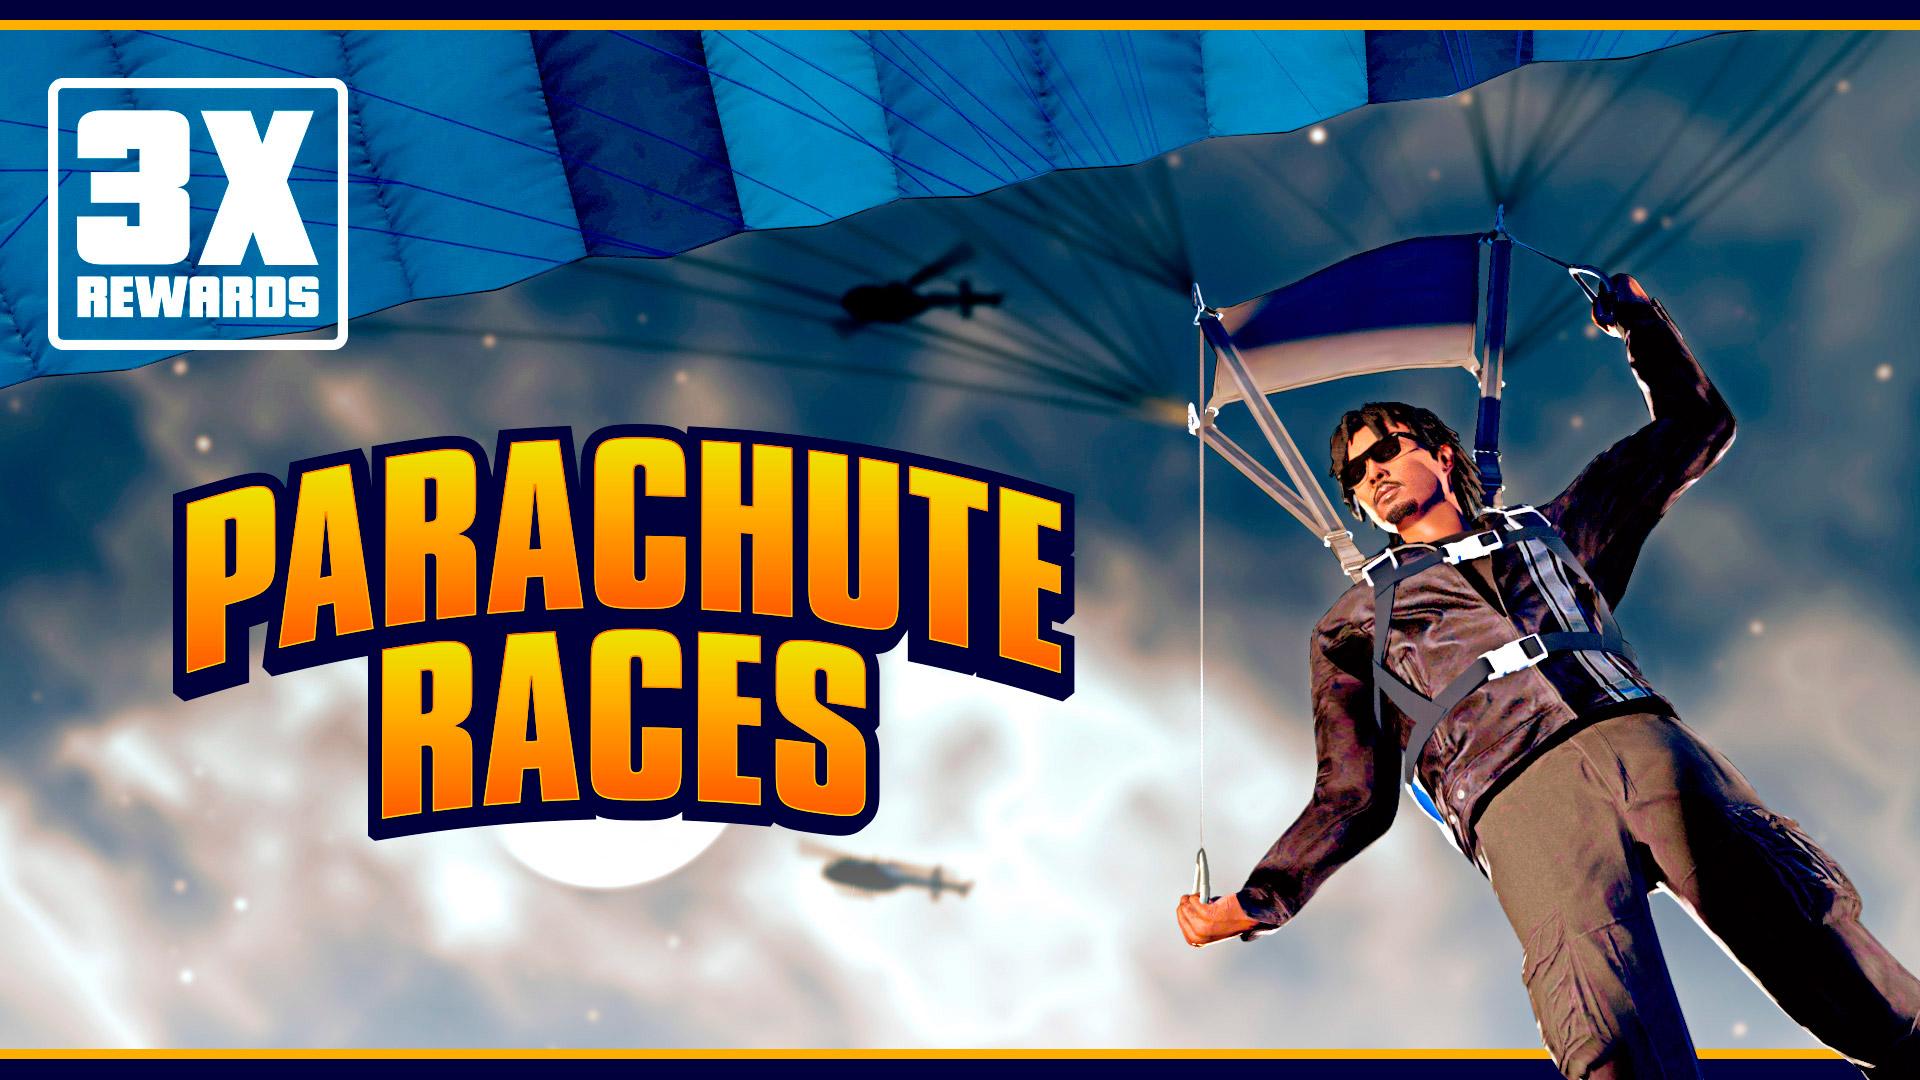 https://media.rockstargames.com/rockstargames-newsite/uploads/gtaonline/event204/parachute.jpg